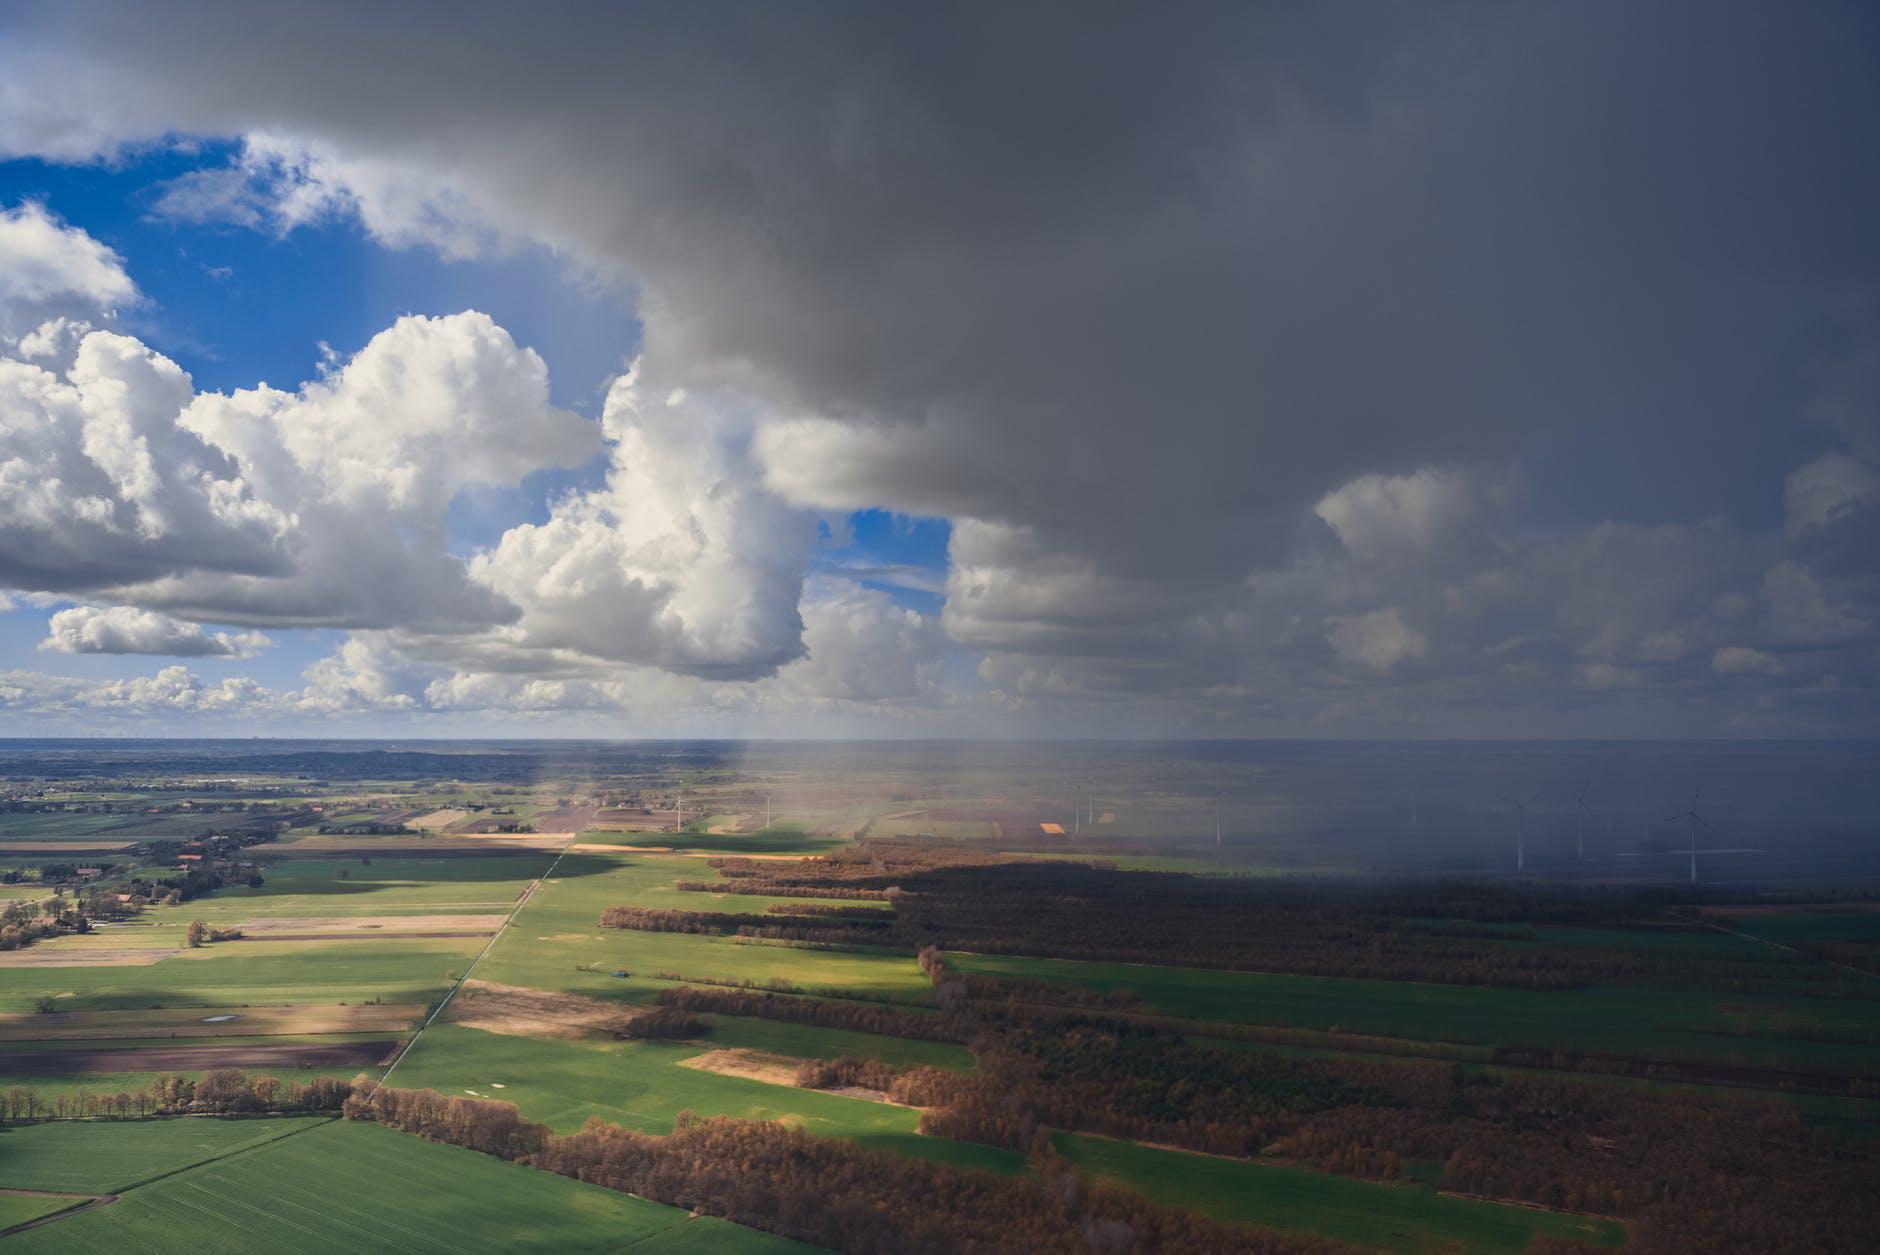 Soja Brasil: veja a previsão do tempo para esta semana